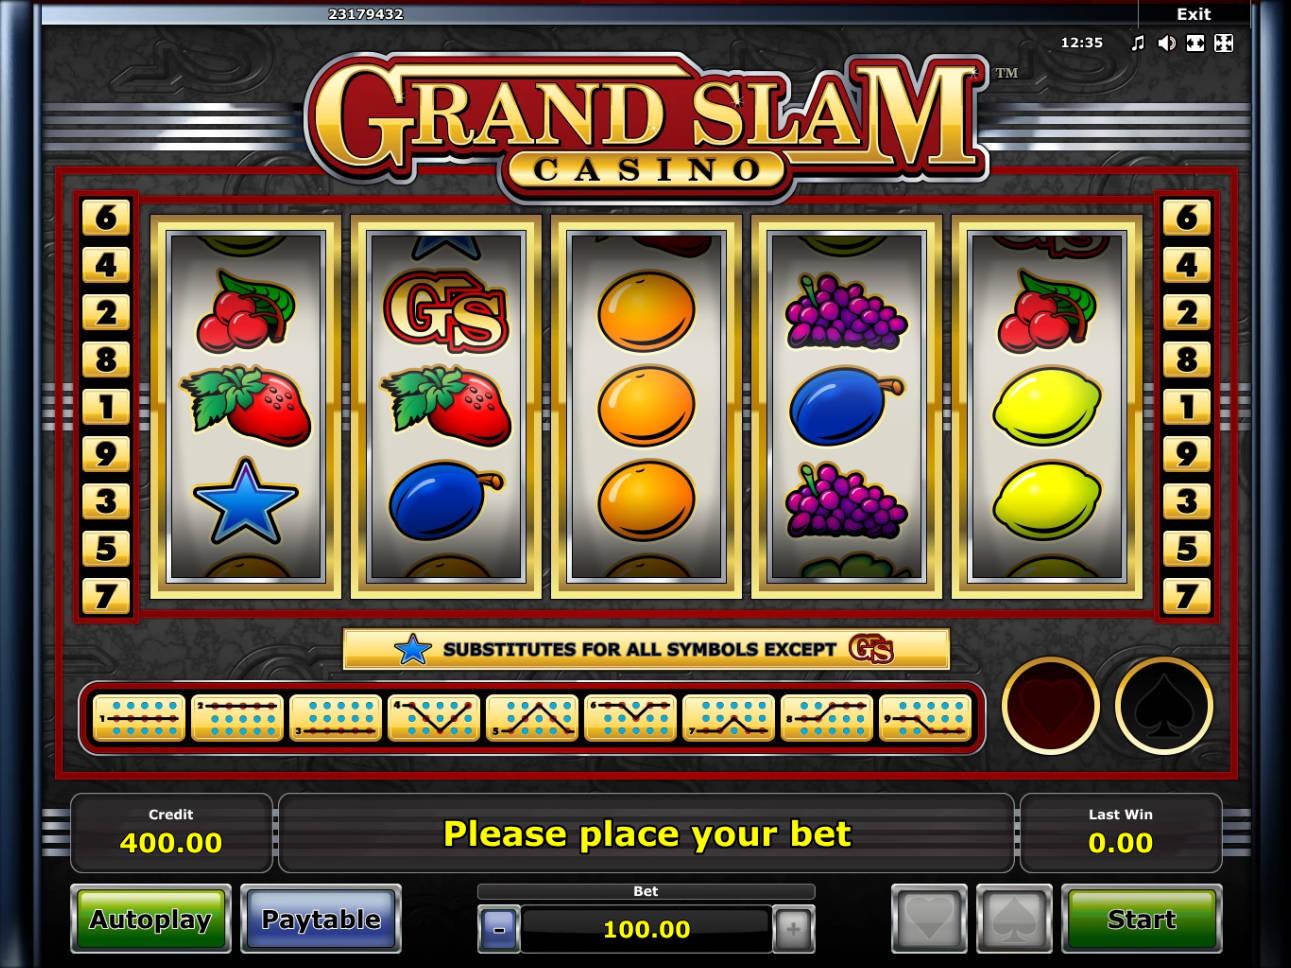 Jelly bean casino login